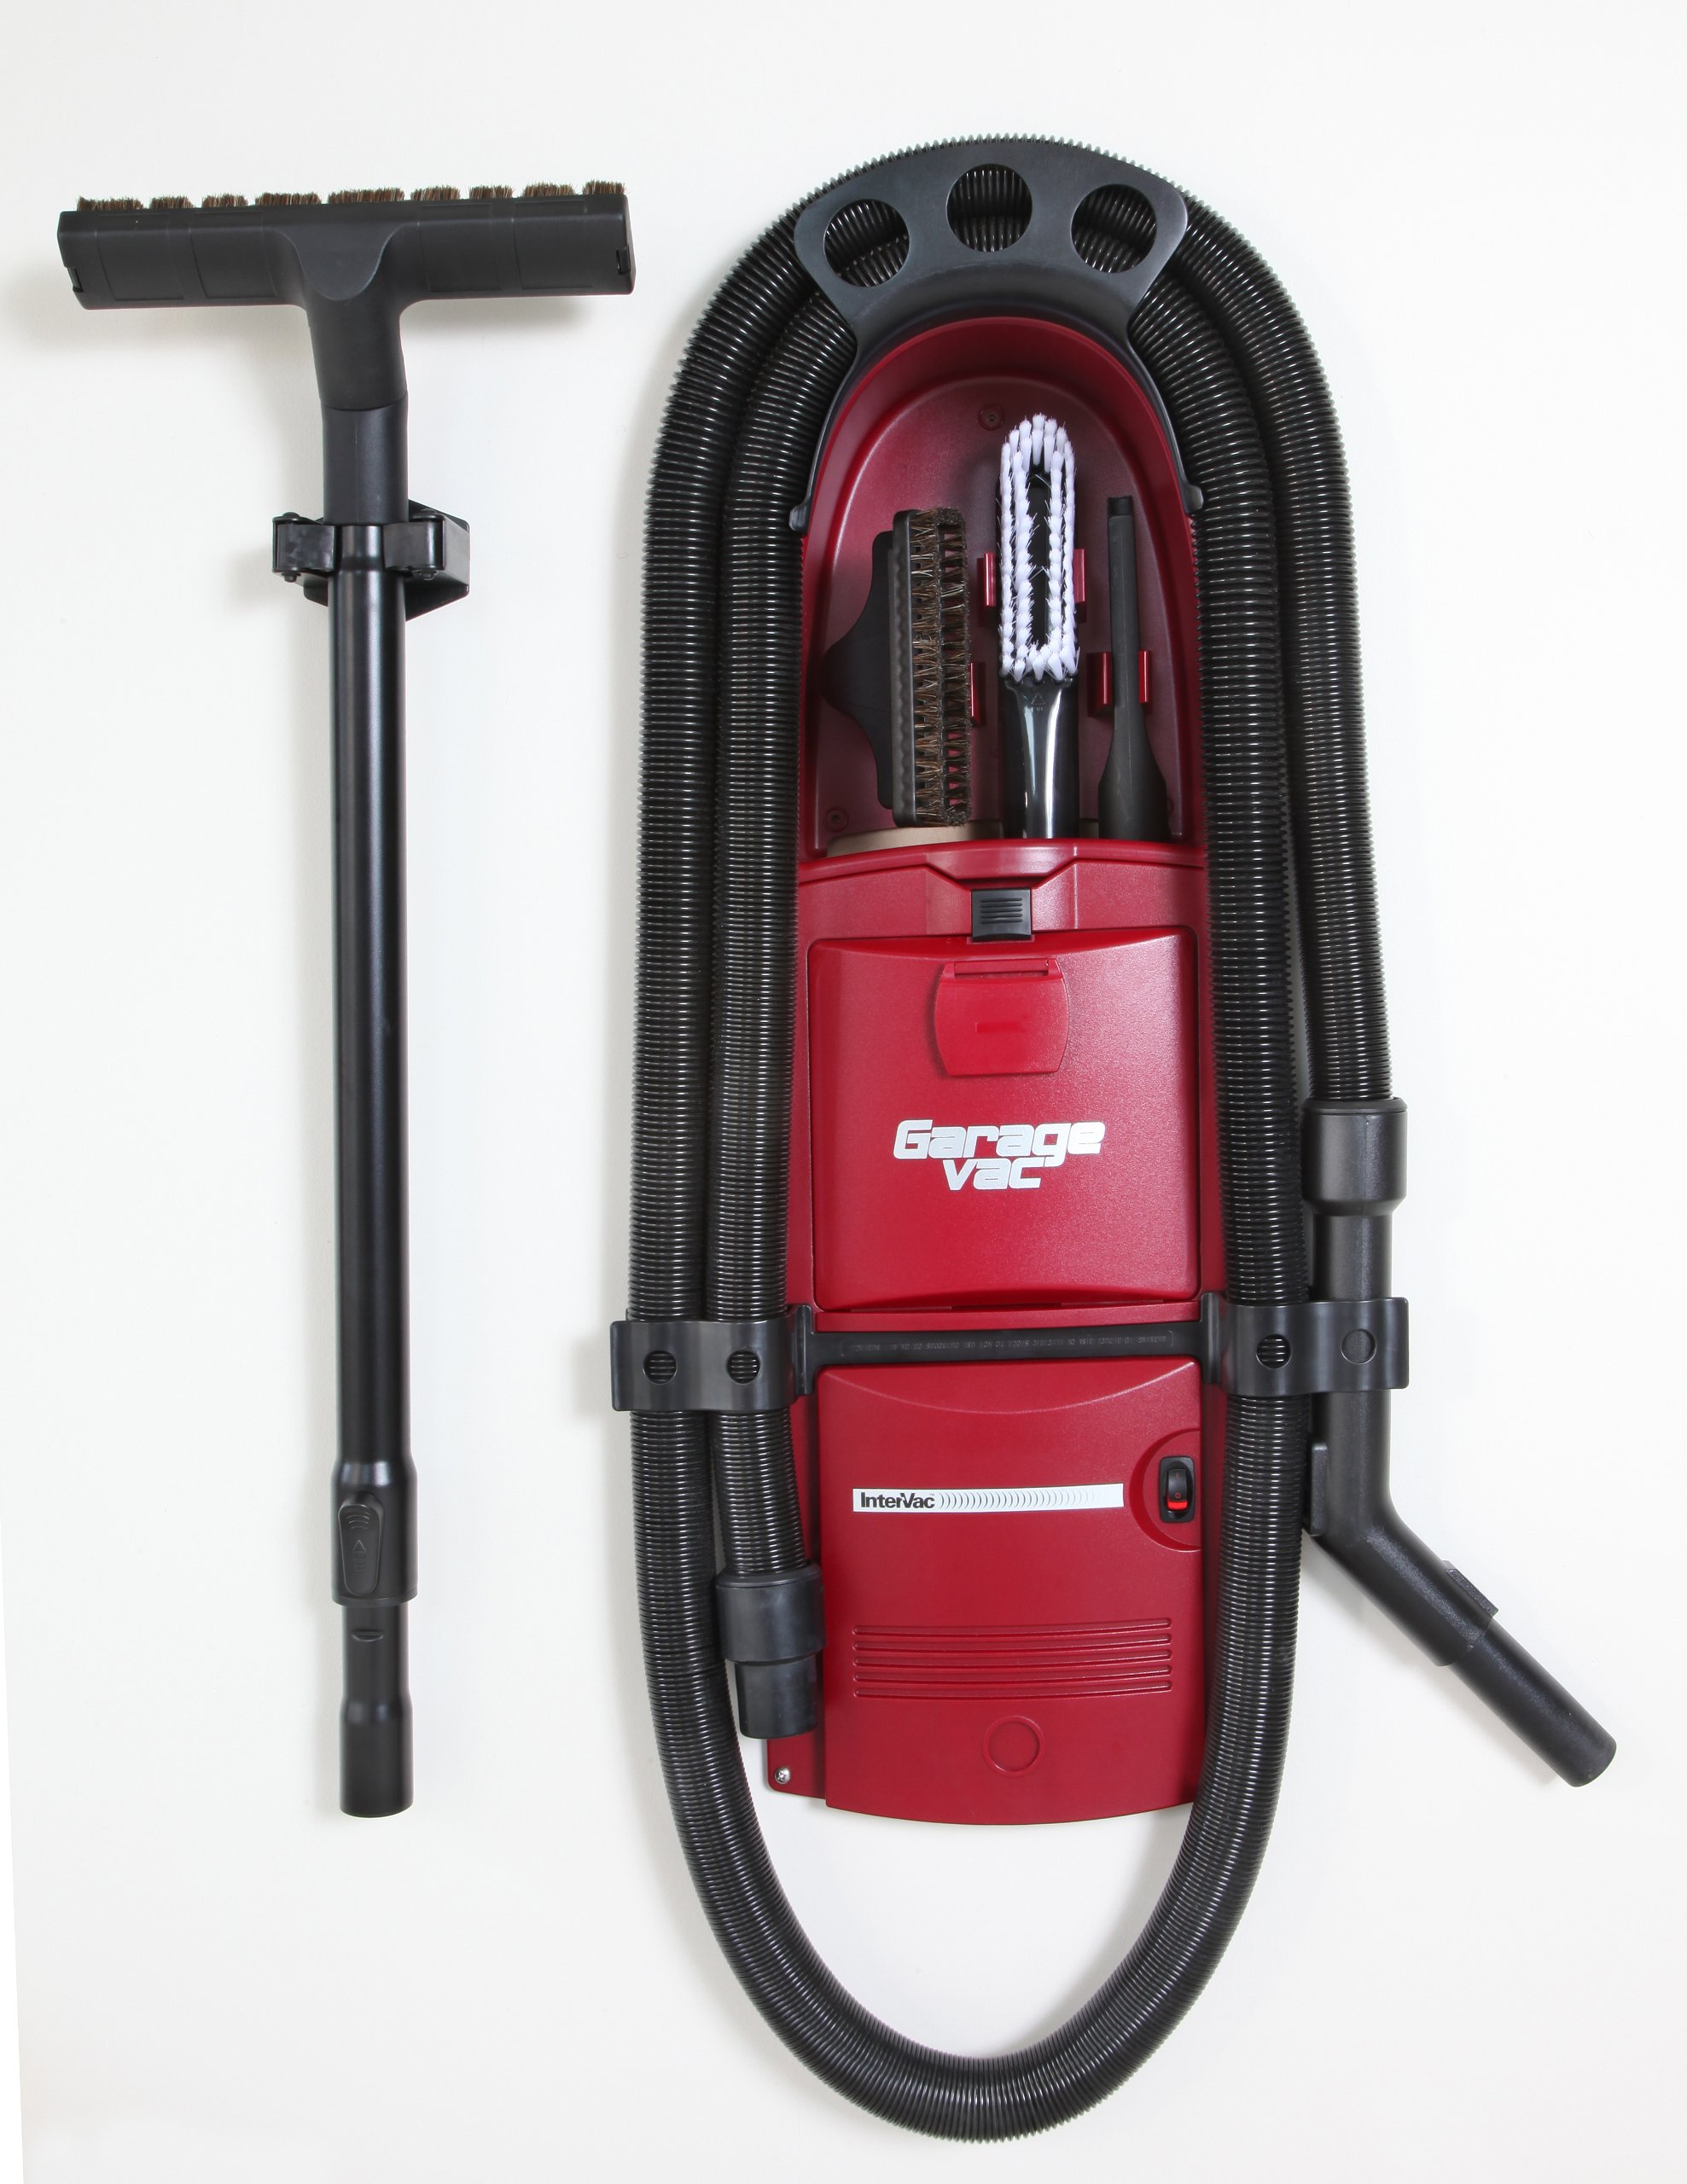 GarageVac GH120-R Red Wall Mounted Garage Vacuum with Accessory